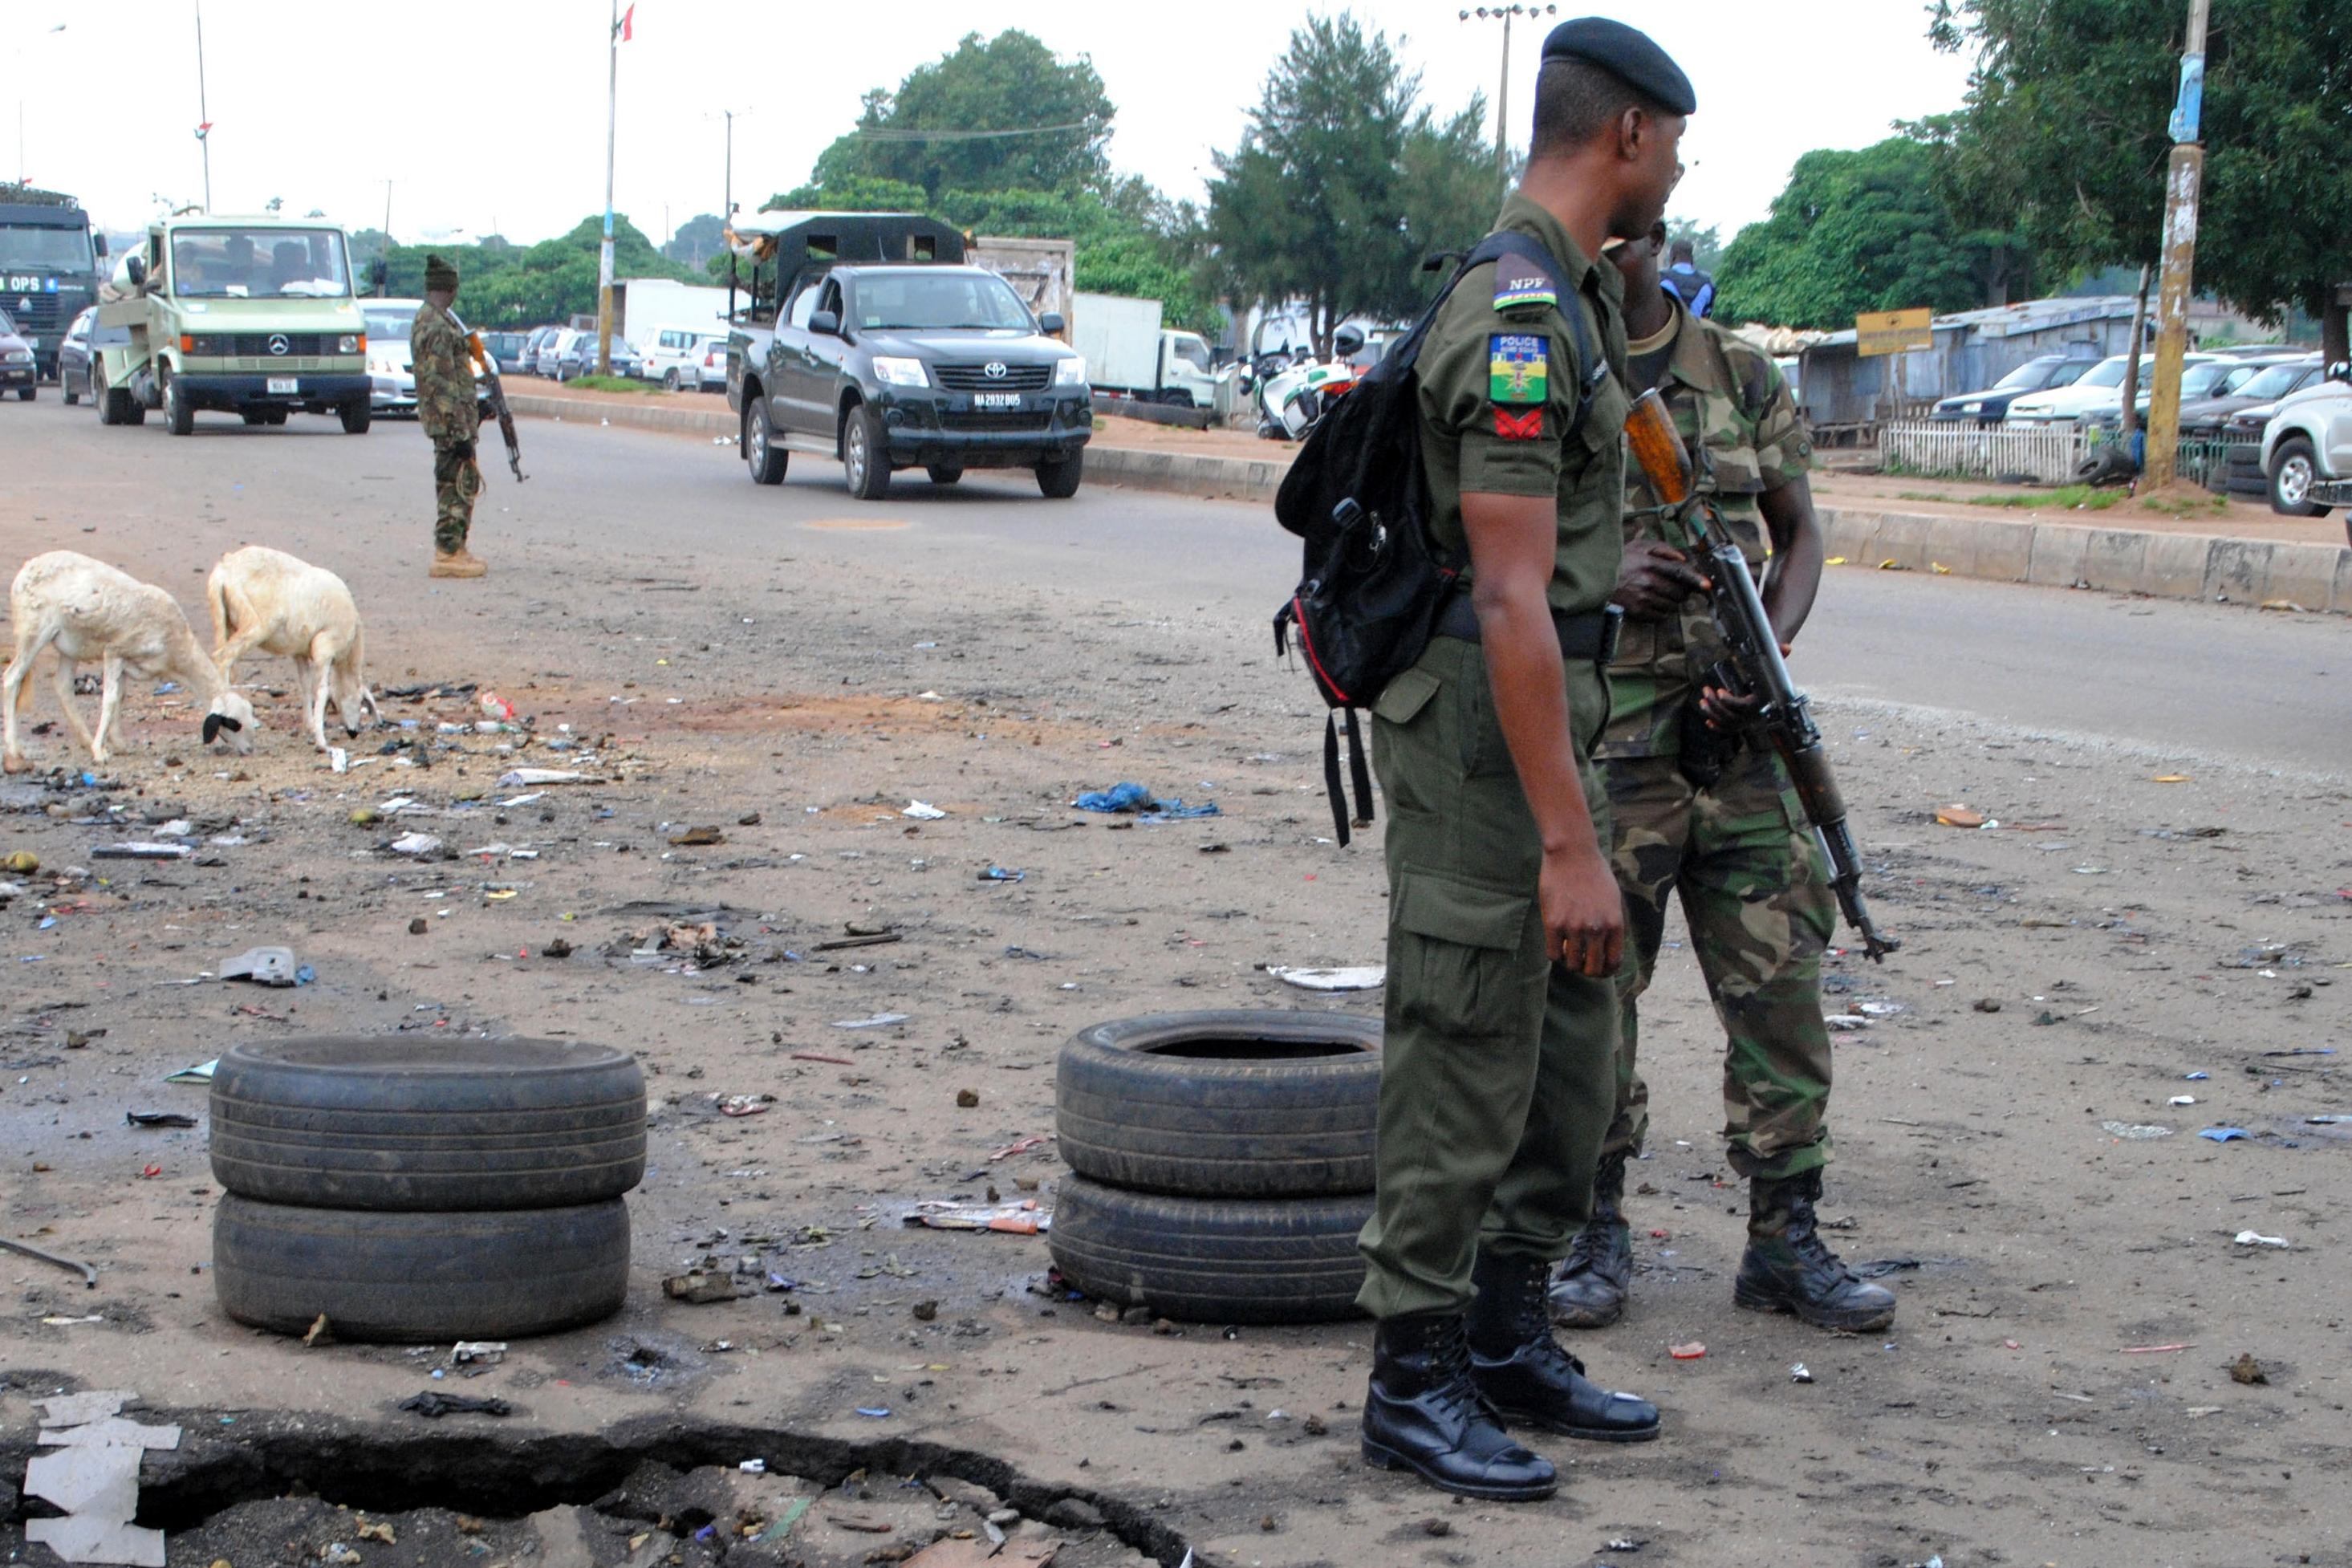 Police officers in Kaduna, Nigeria